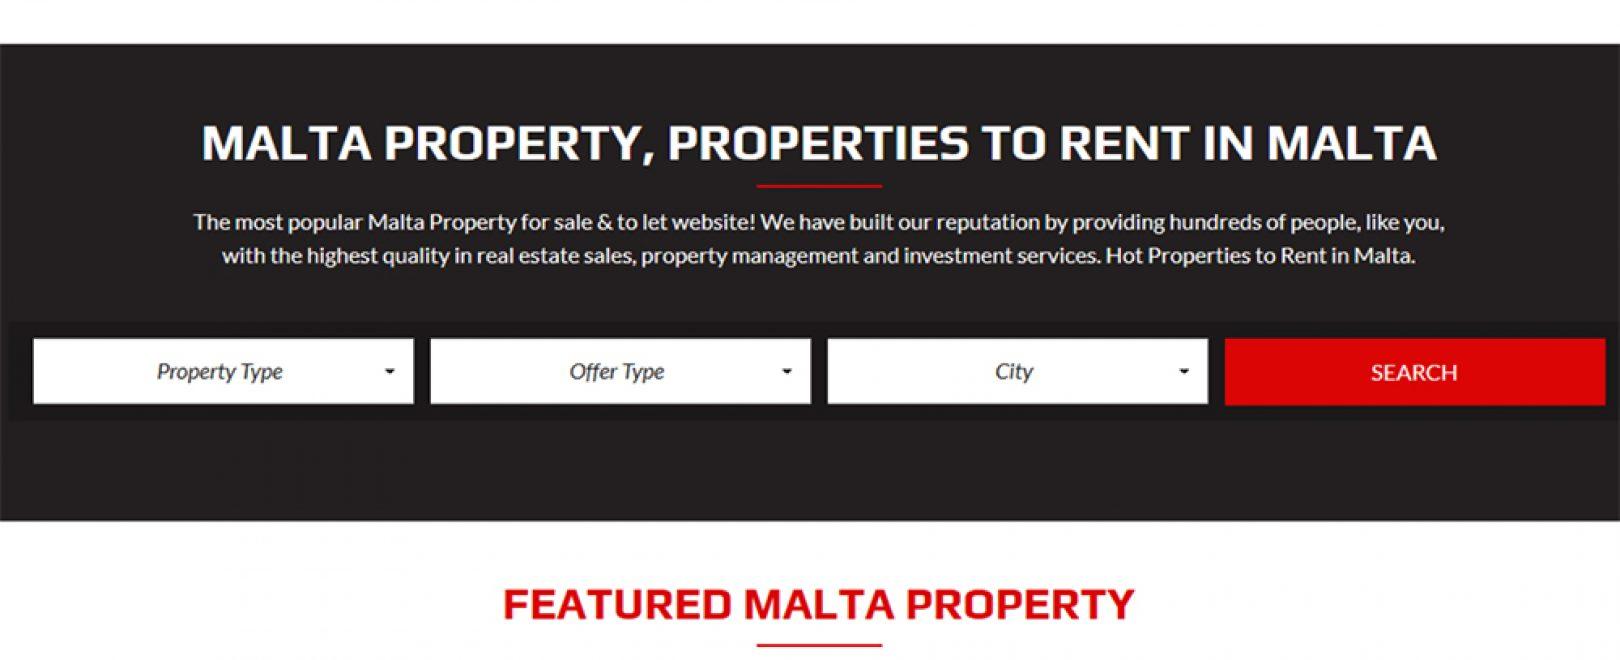 Malta Property